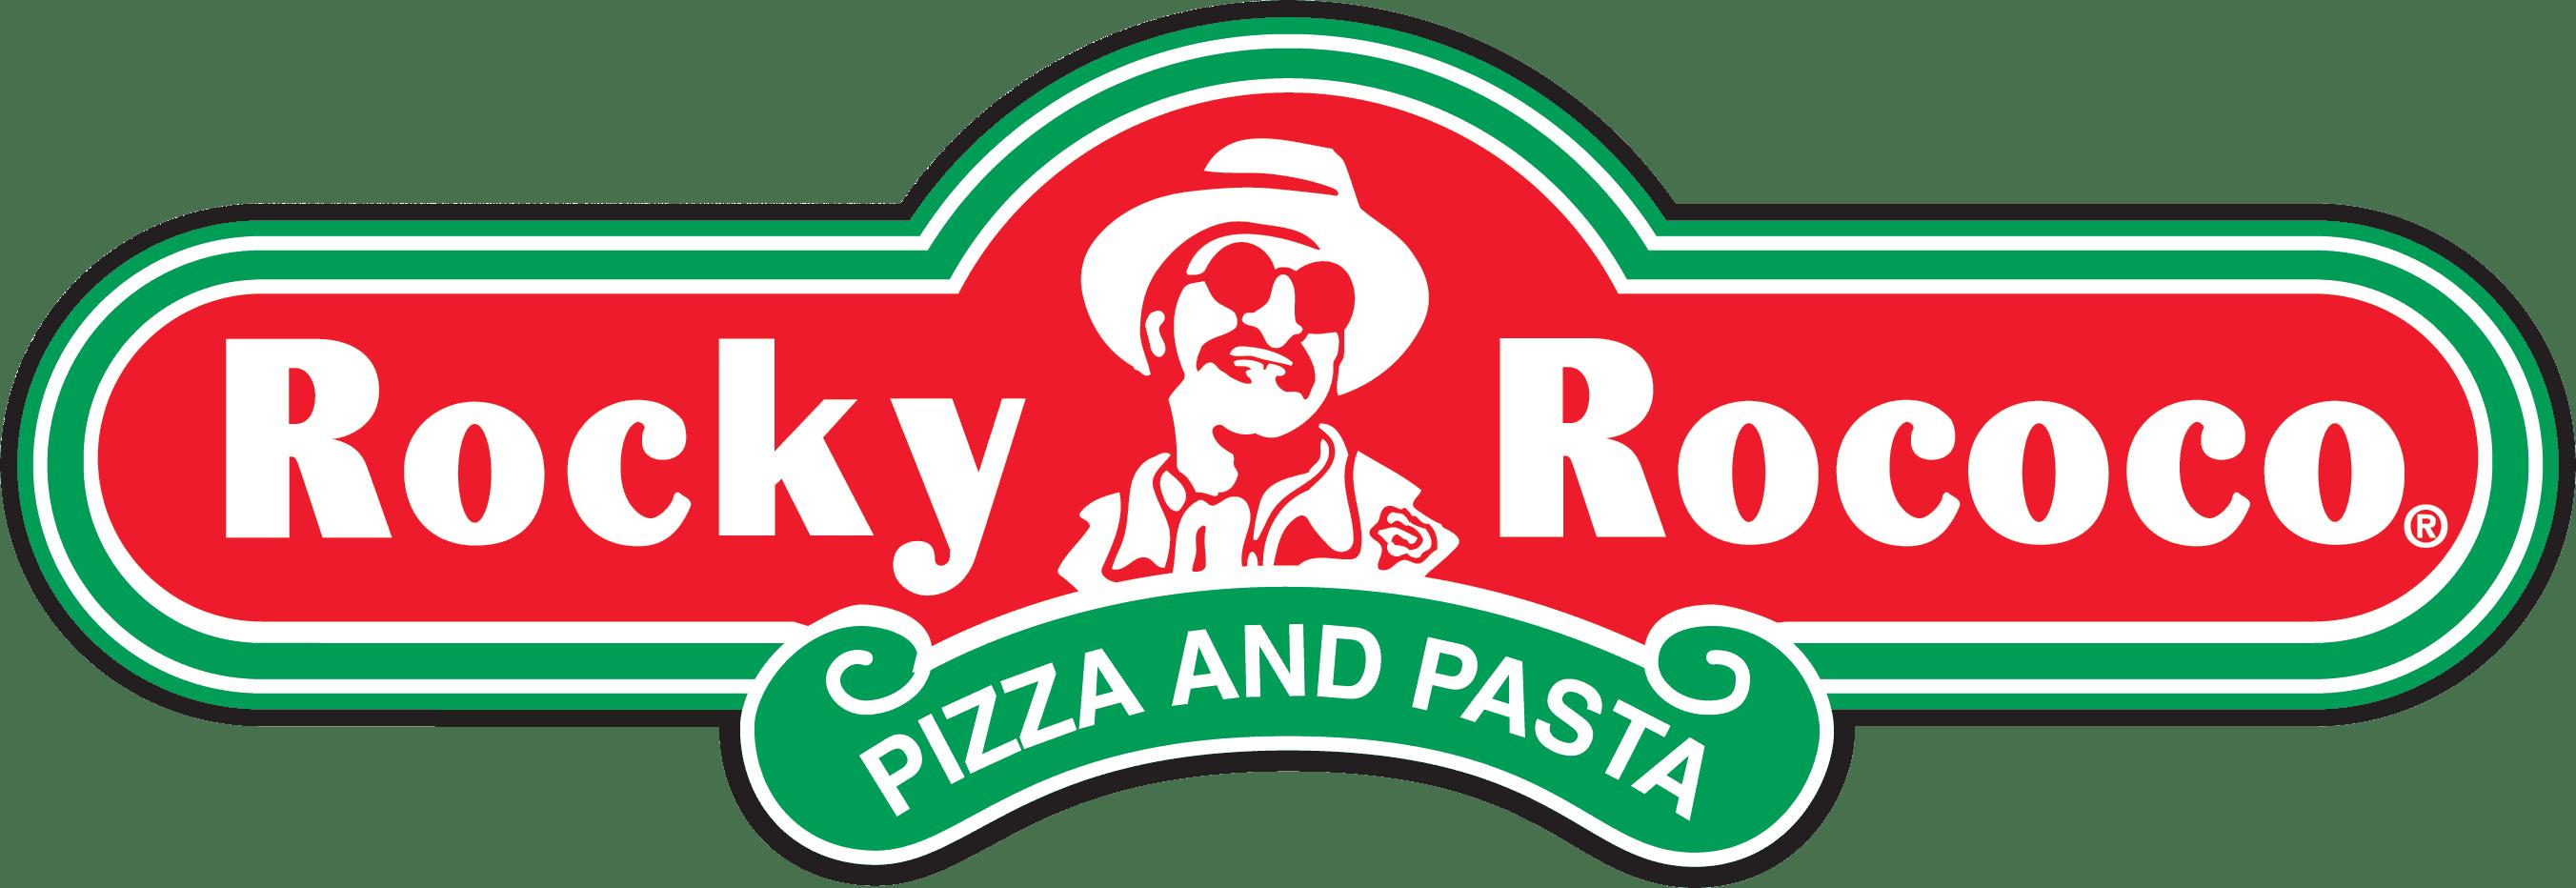 Rocky Rococo Restaurants